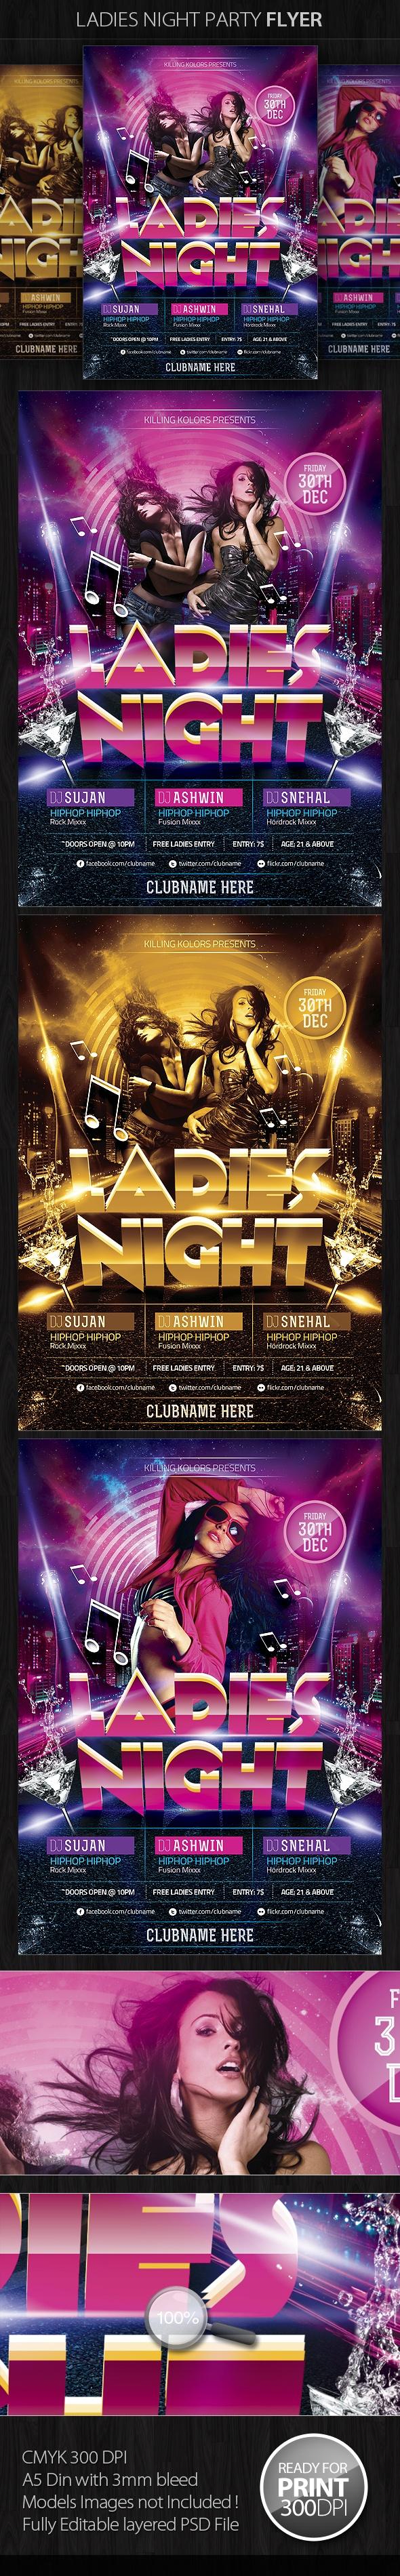 Ladies Night Party Flyer by Mahantesh Nagashetty, via Behance